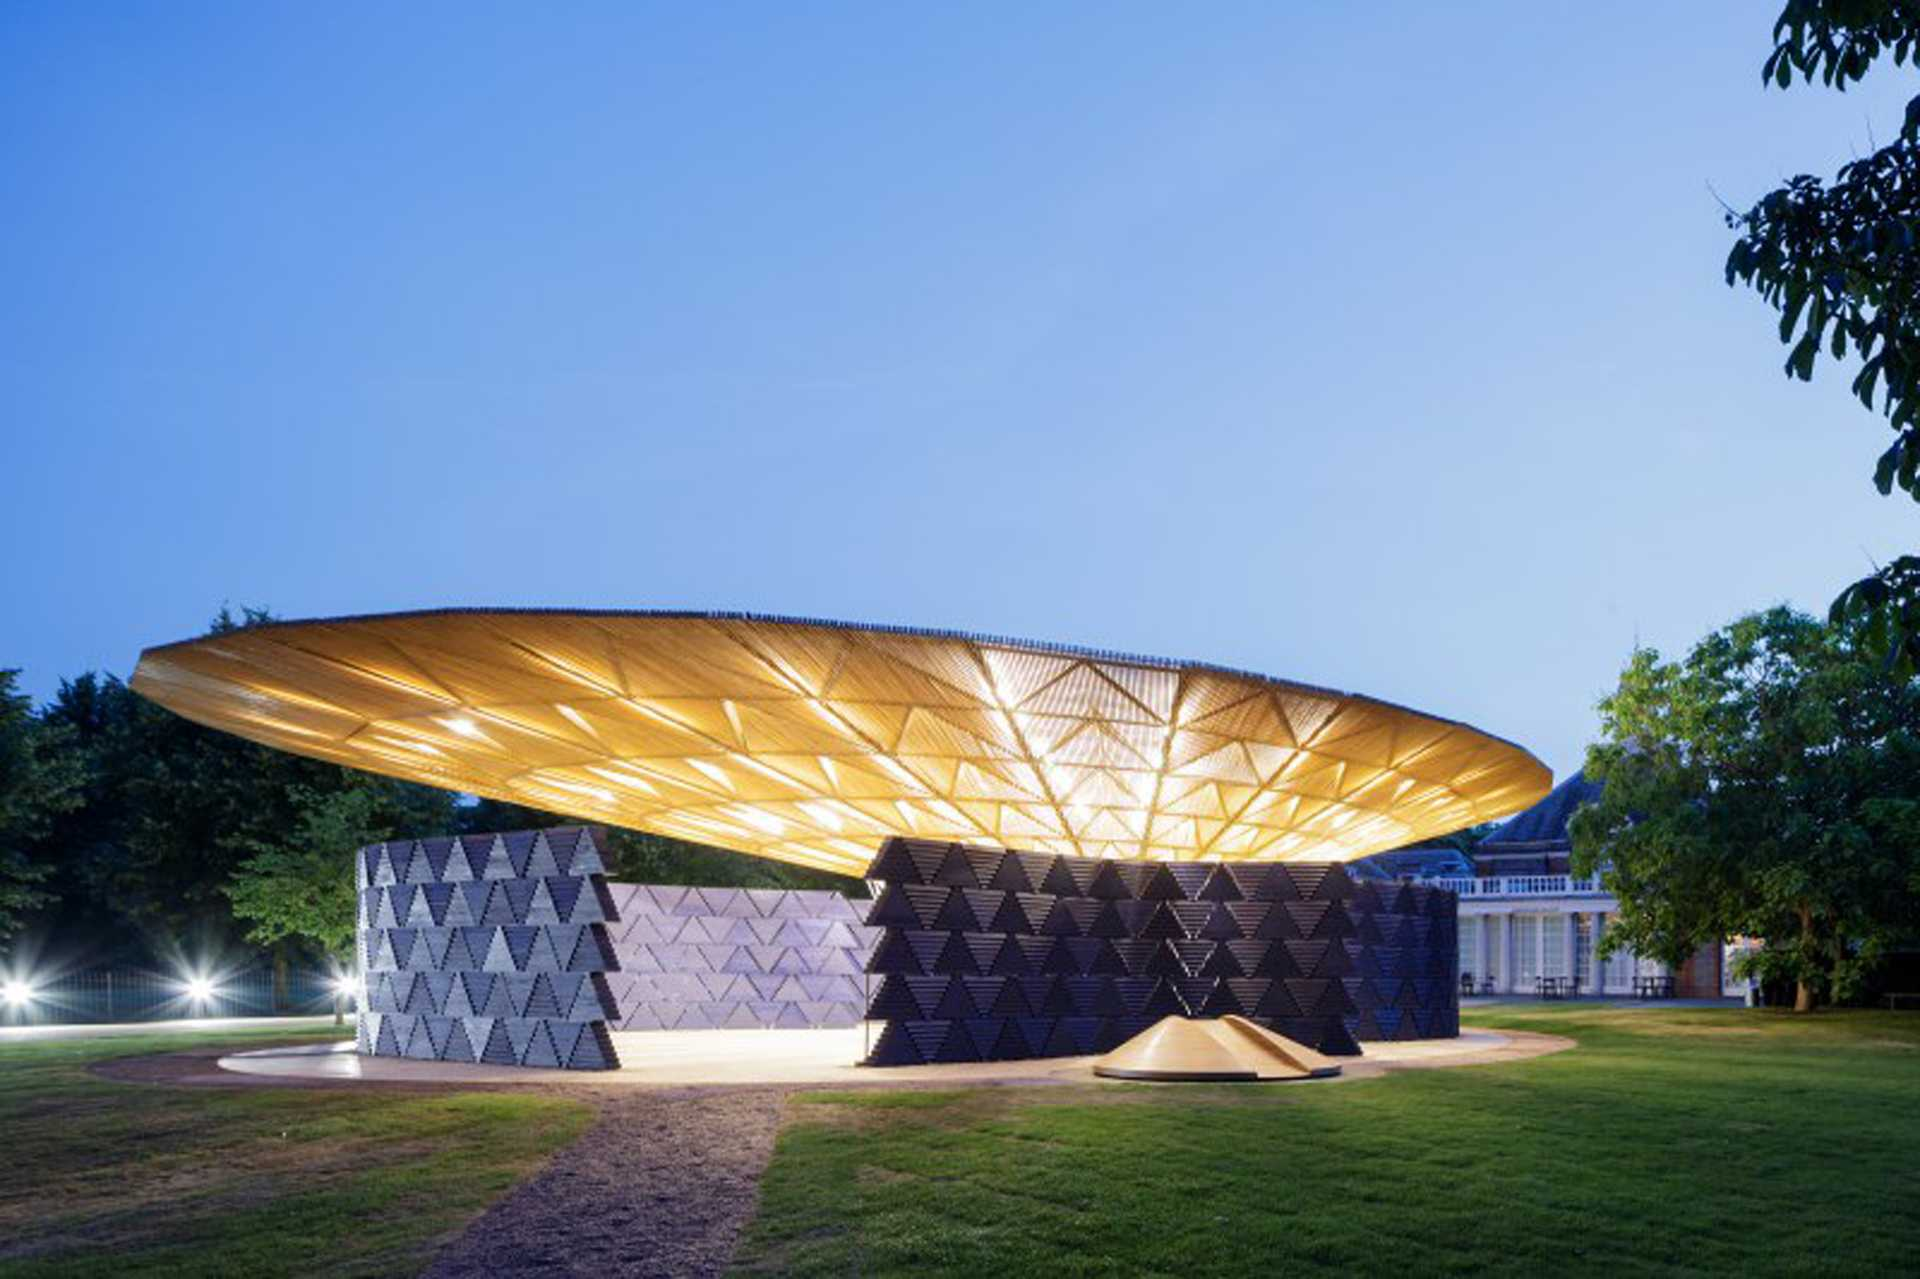 Serpentine Pavilion 2017  - 46 03 34